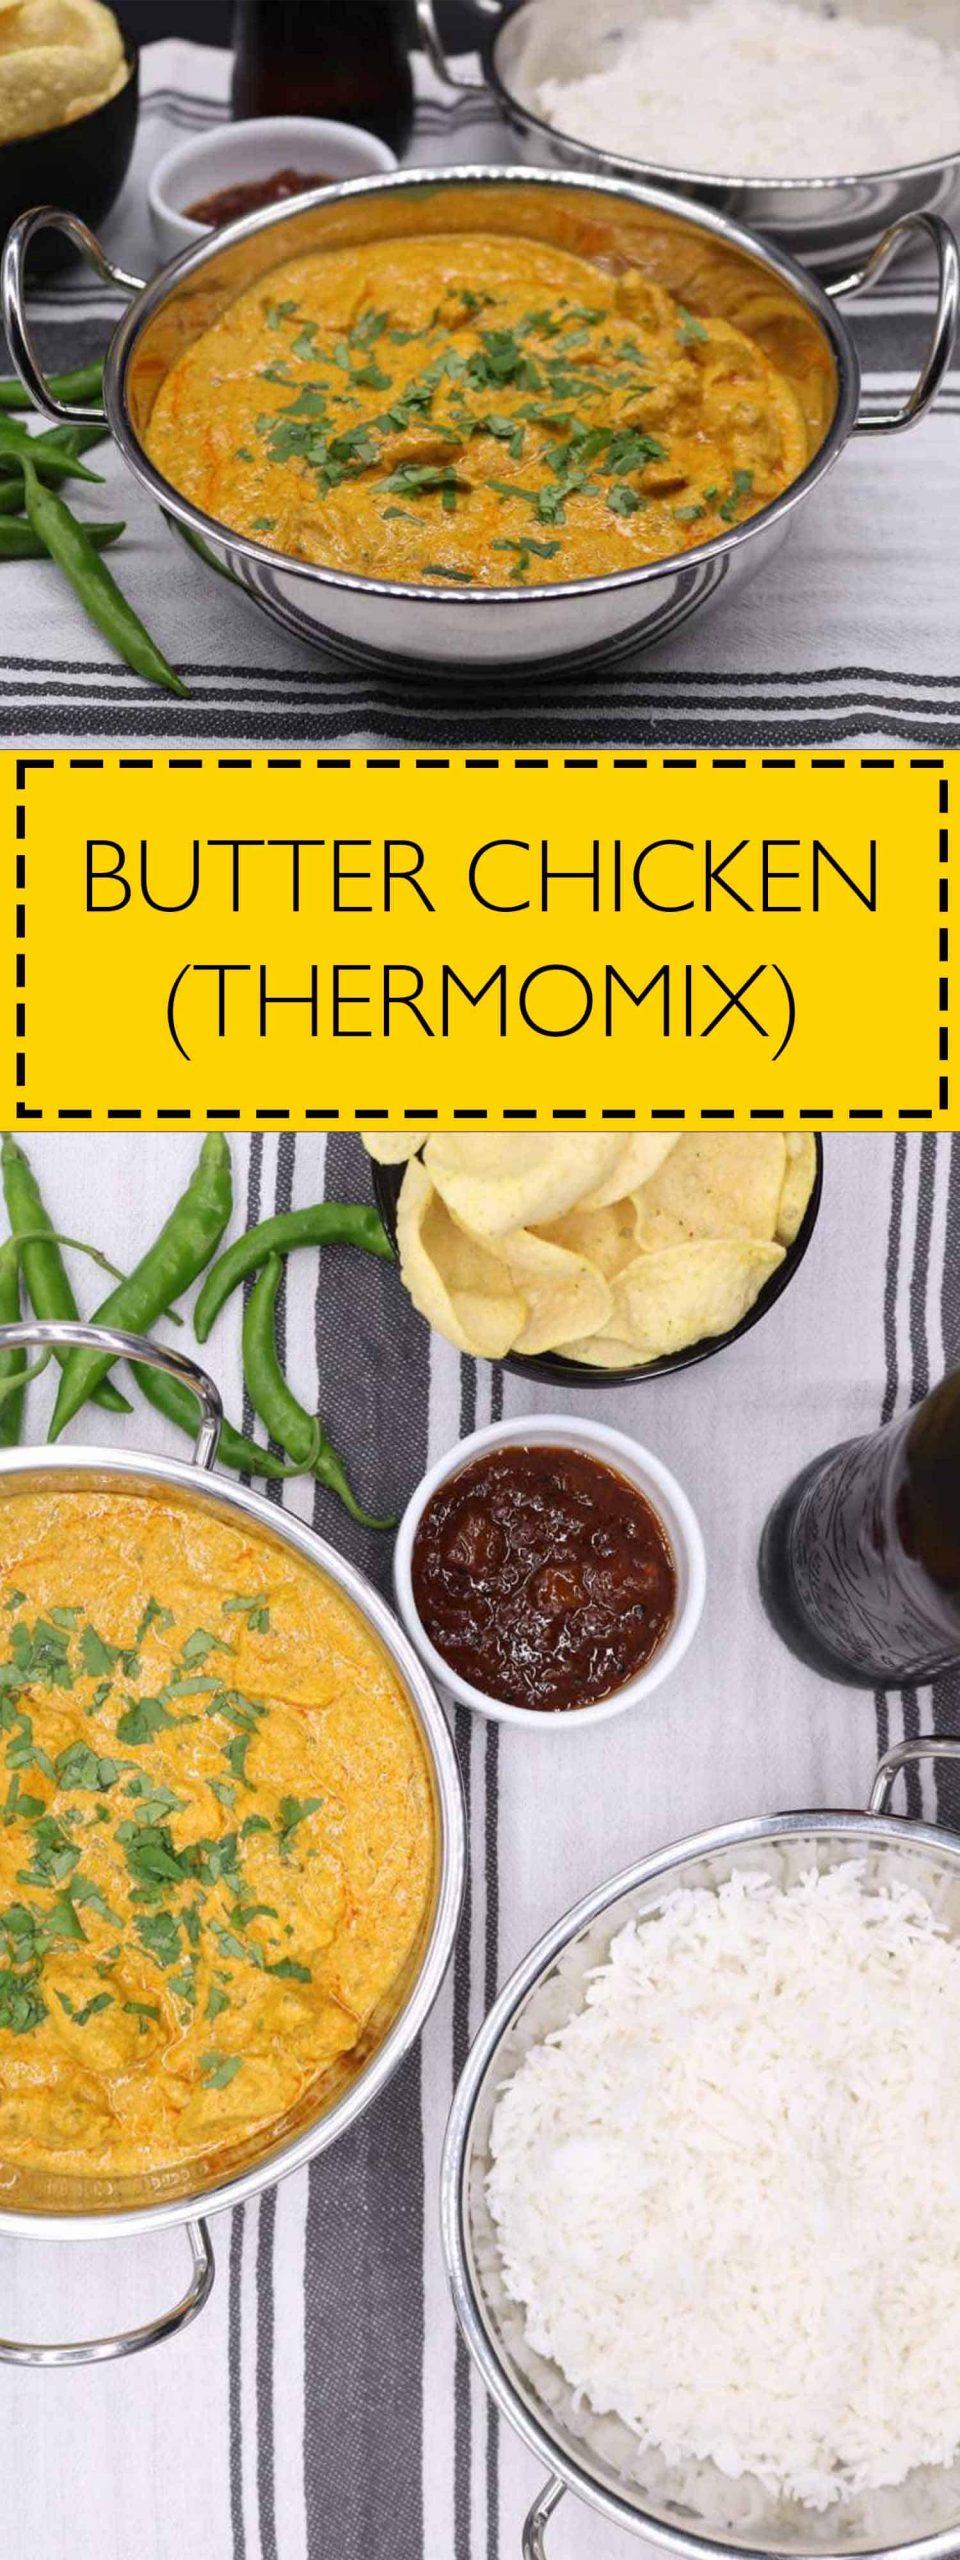 Butter Chicken (Thermomix), Butter Chicken (Thermomix)